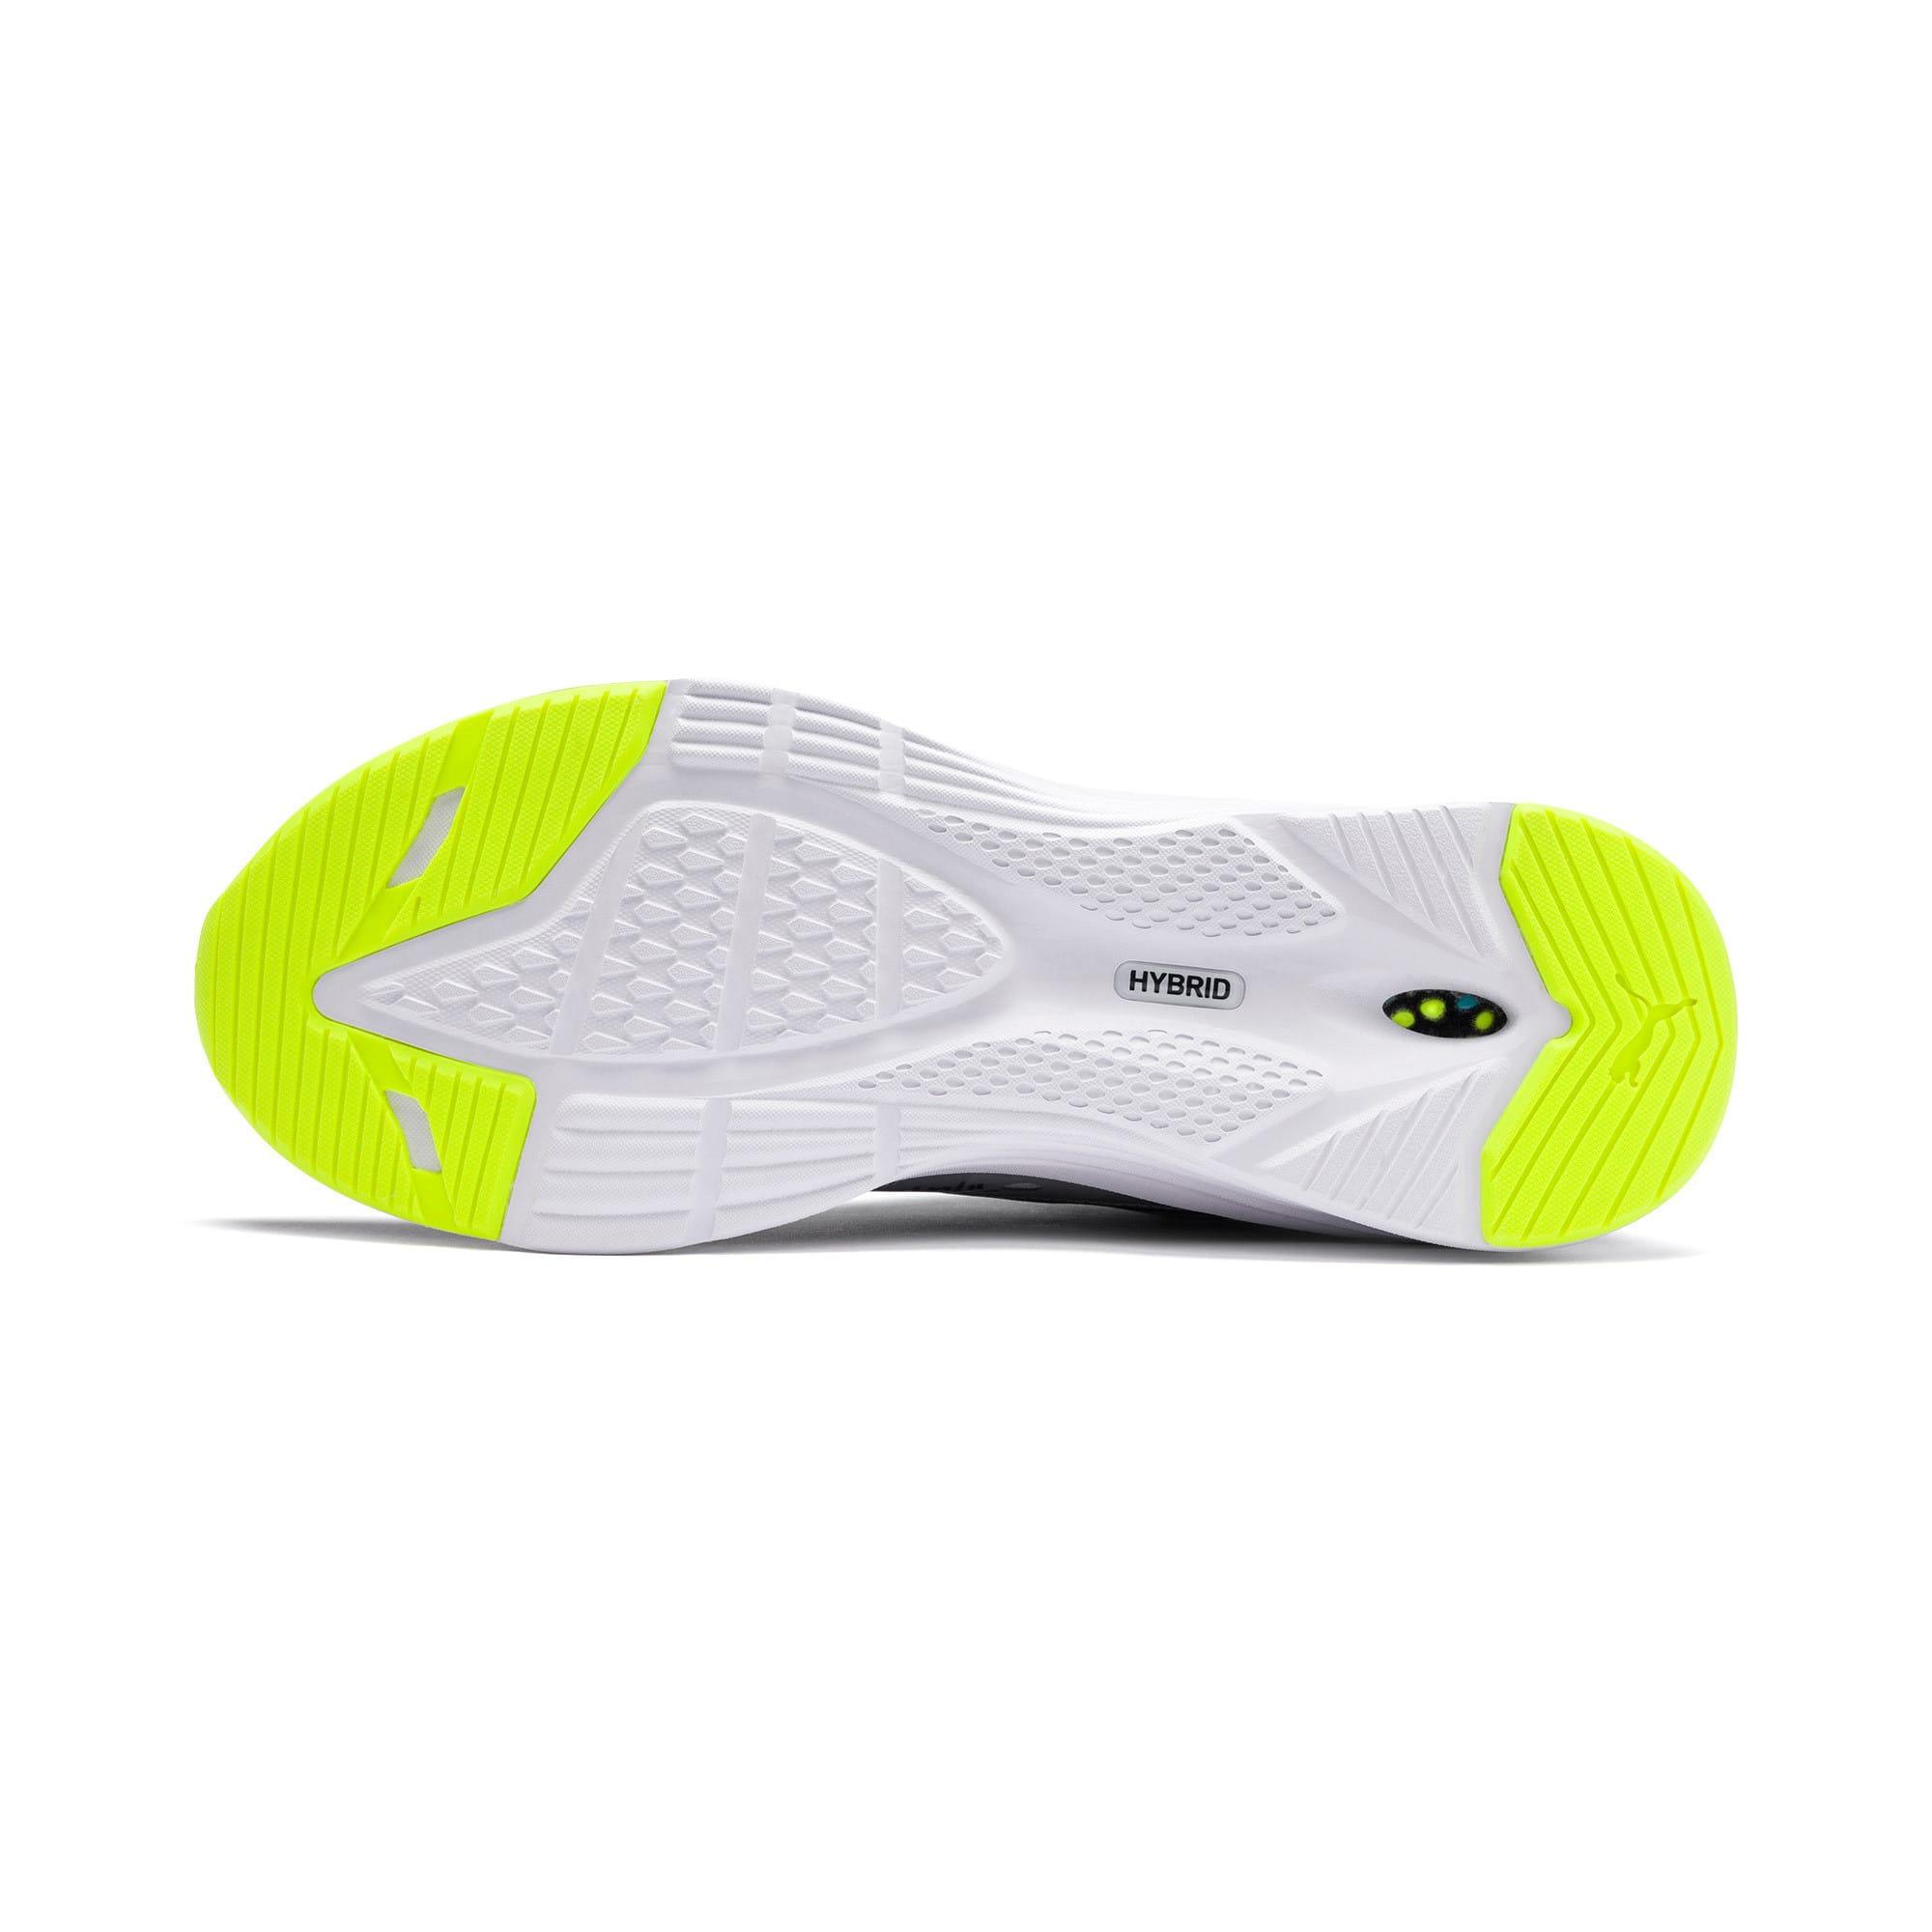 Miniatura 4 de Zapatos para correr HYBRID Fuego para hombre, High Rise-Blue Turquoise, mediano